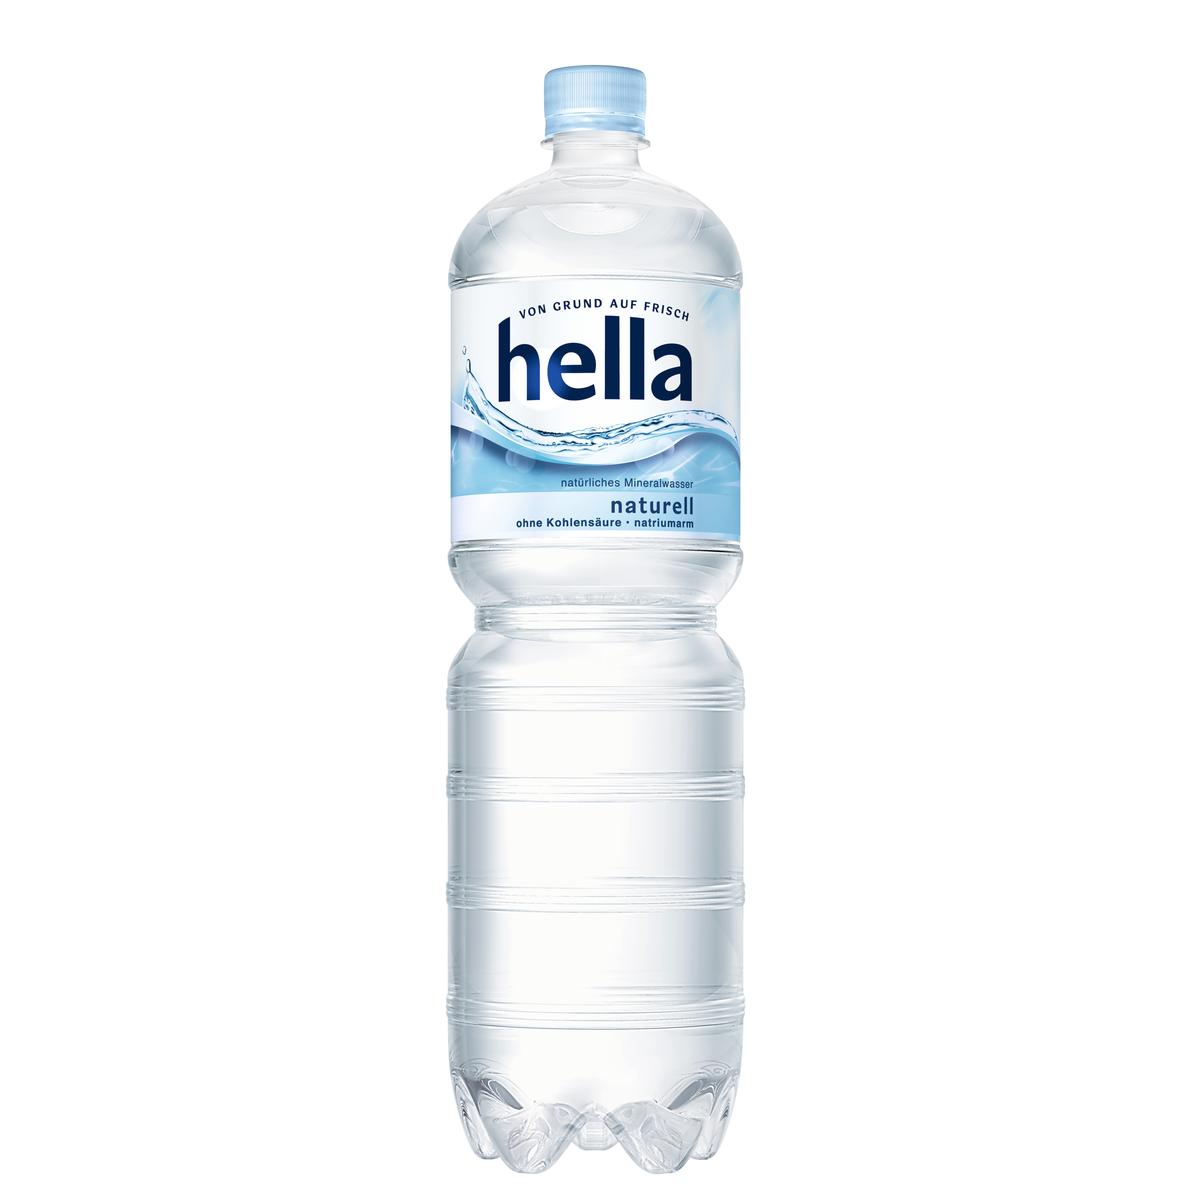 hella Naturell 1,5l | Wasser | Alkoholfreie Getränke | Sortiment ...